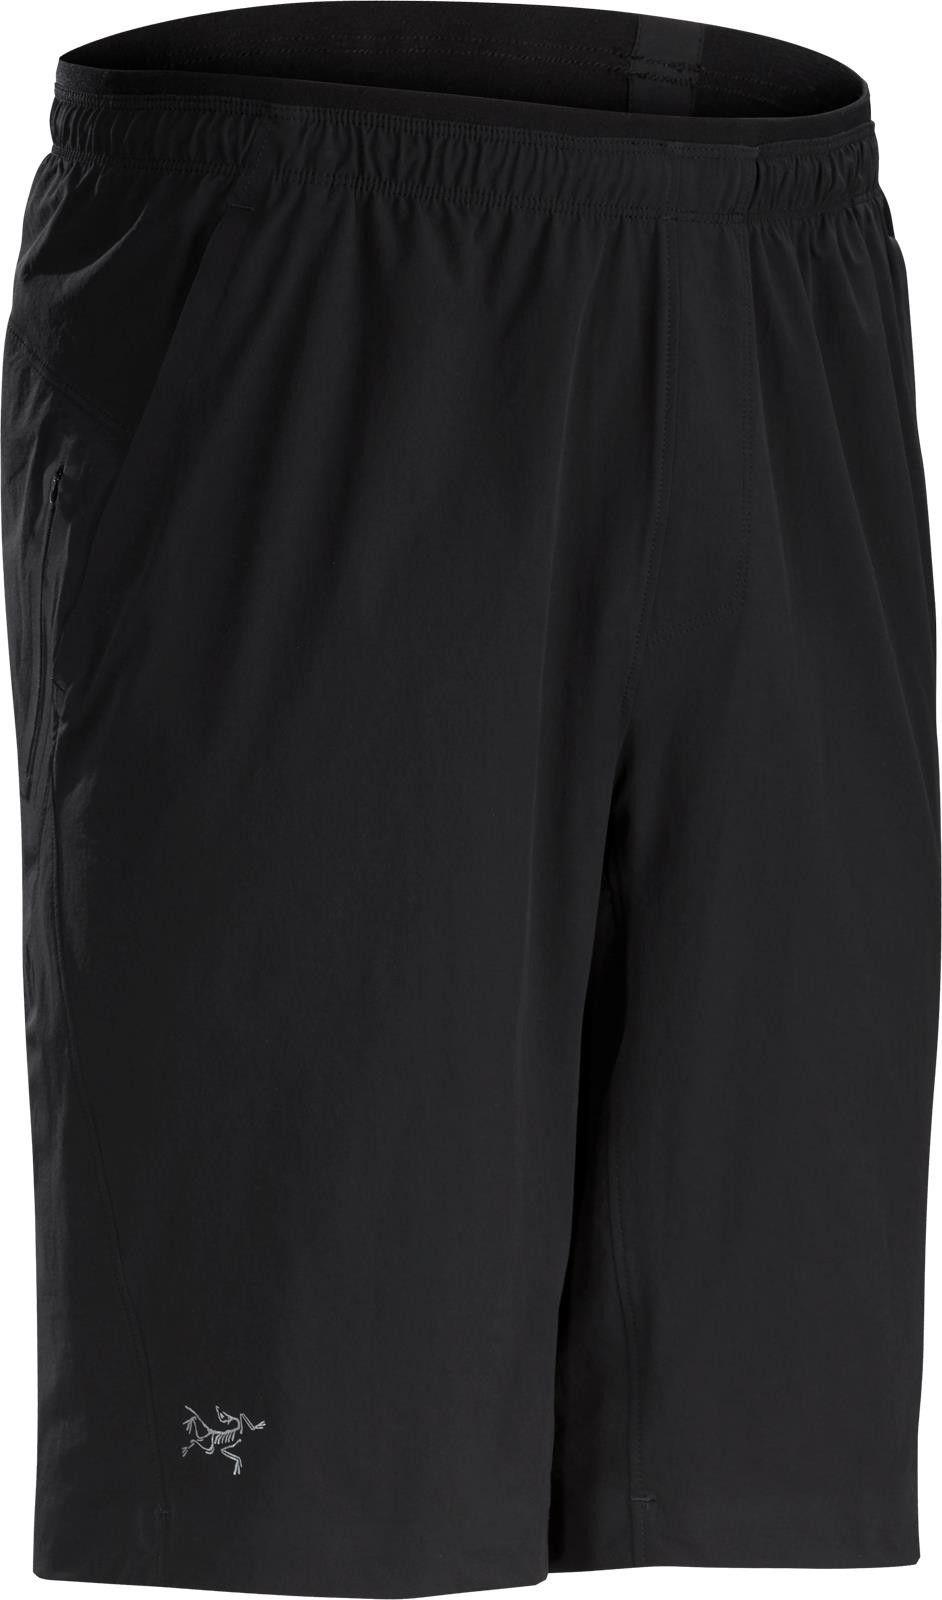 Arcteryx M Aptin Short | Größe XL | Herren Shorts